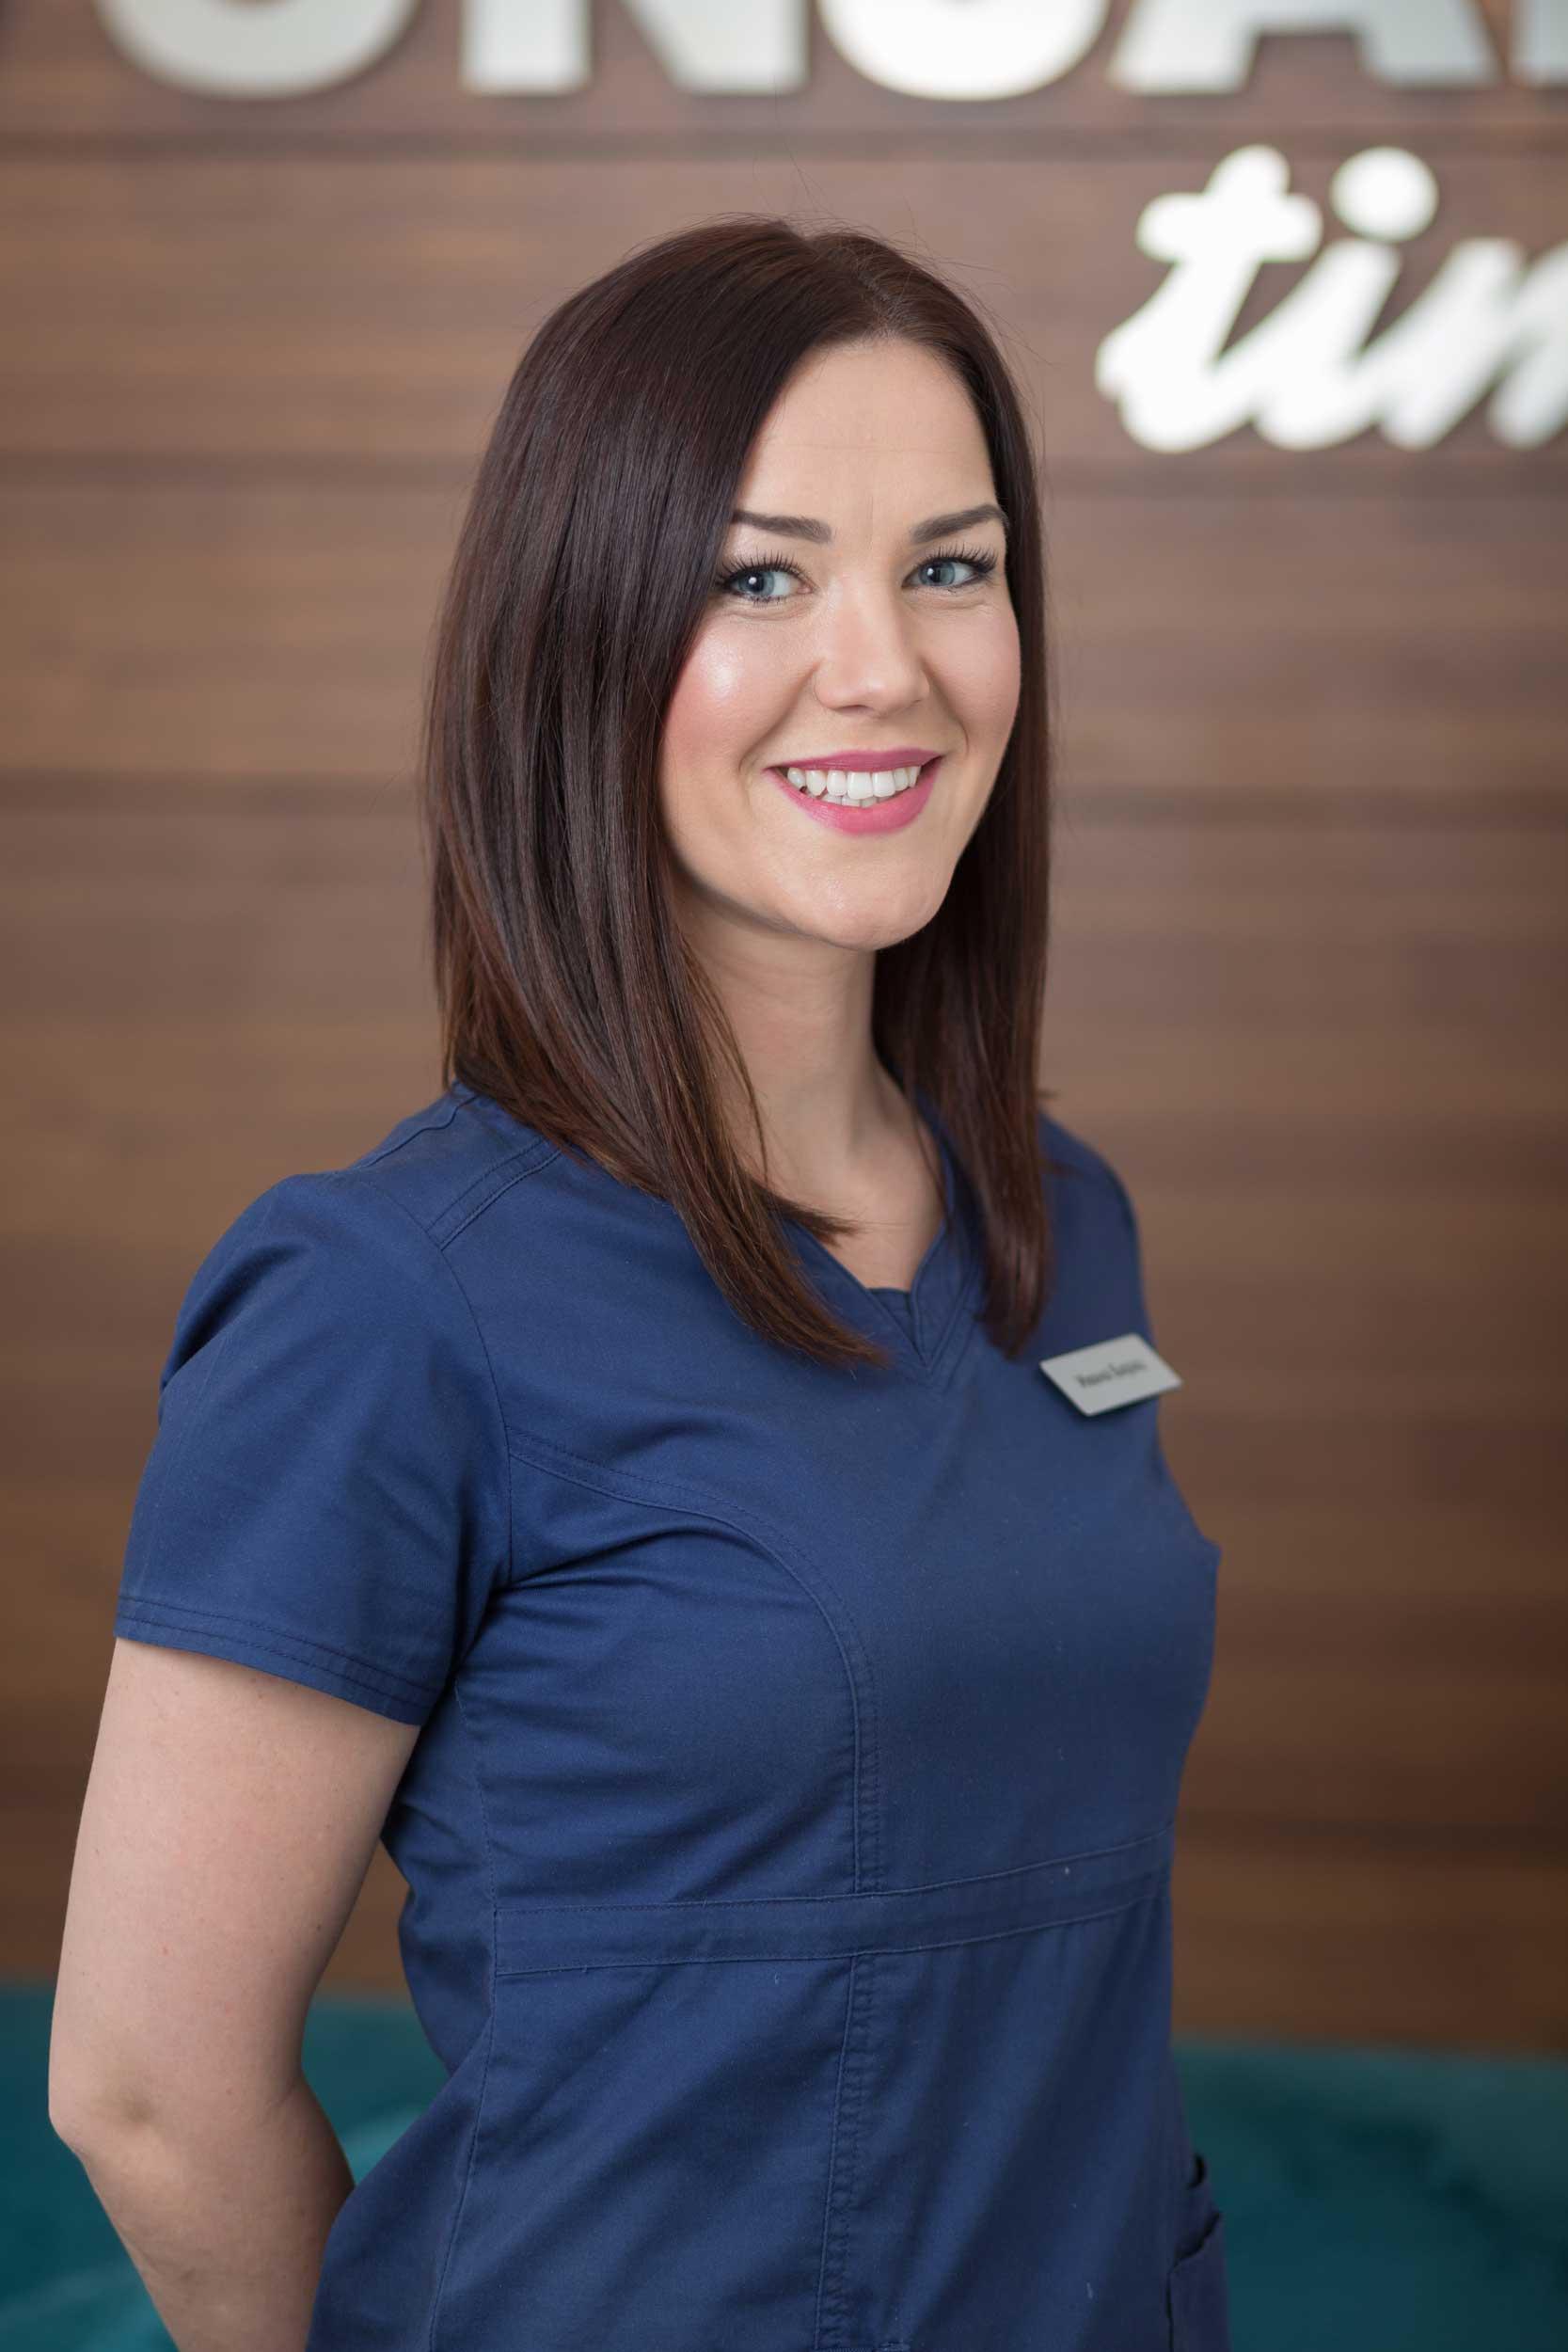 stomatoloska-ordinacija-vunjak-dental-clinic-asistent-ivana-barac